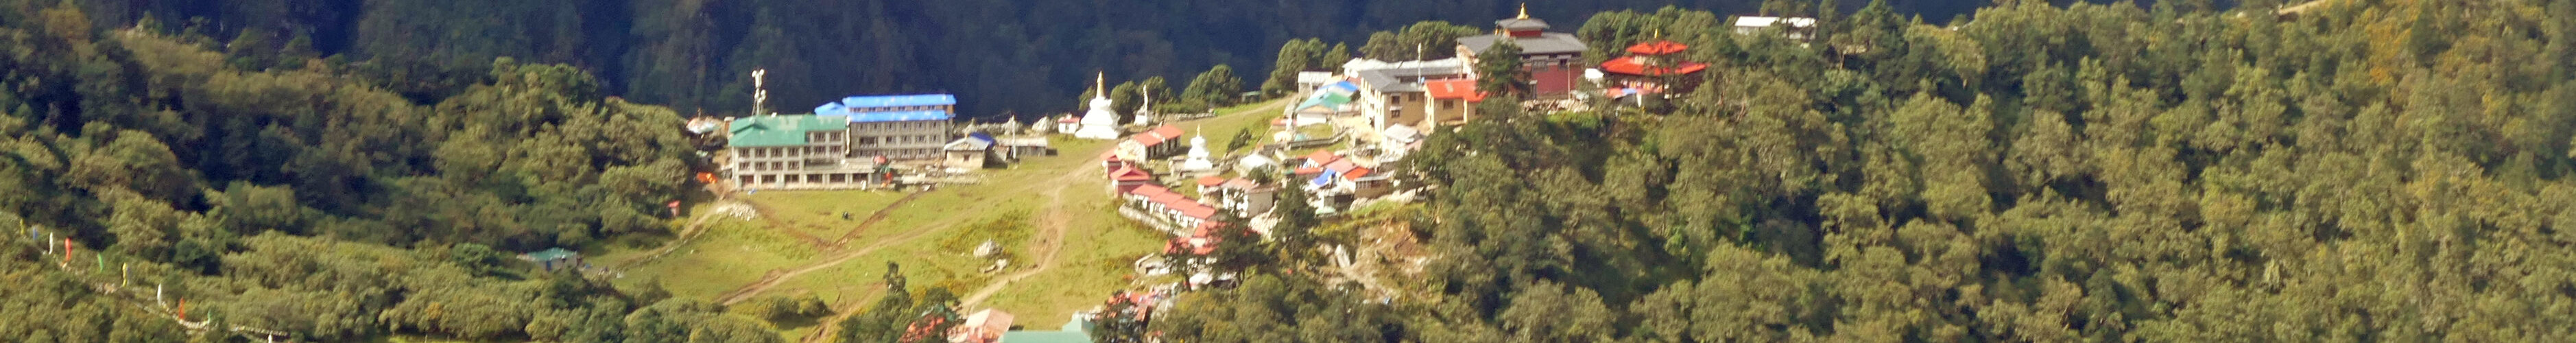 Tengpoche klosteret